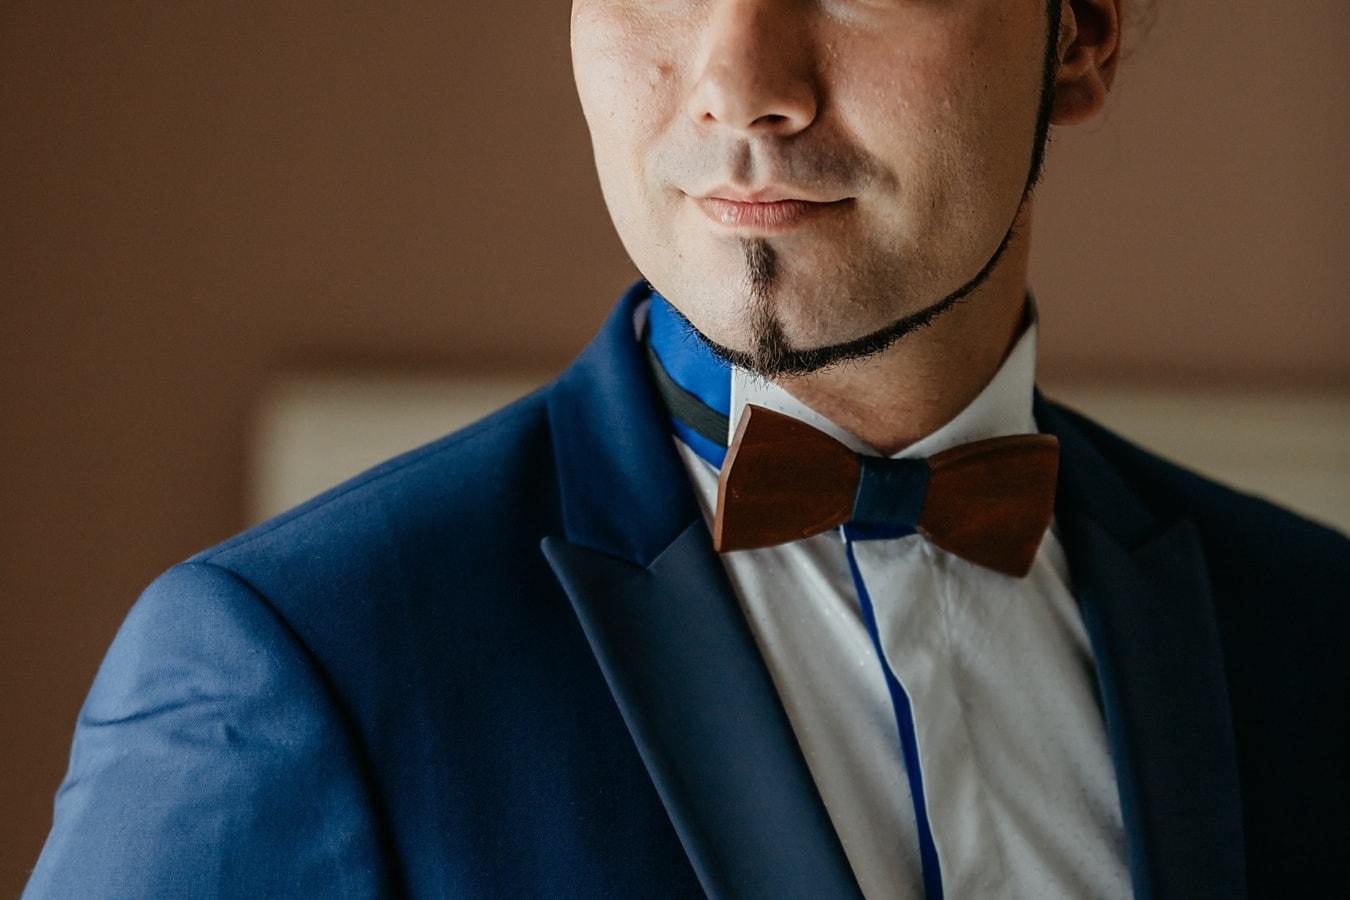 leather, bowtie, tuxedo suit, face, neck, businessman, style, beard, fashion, head